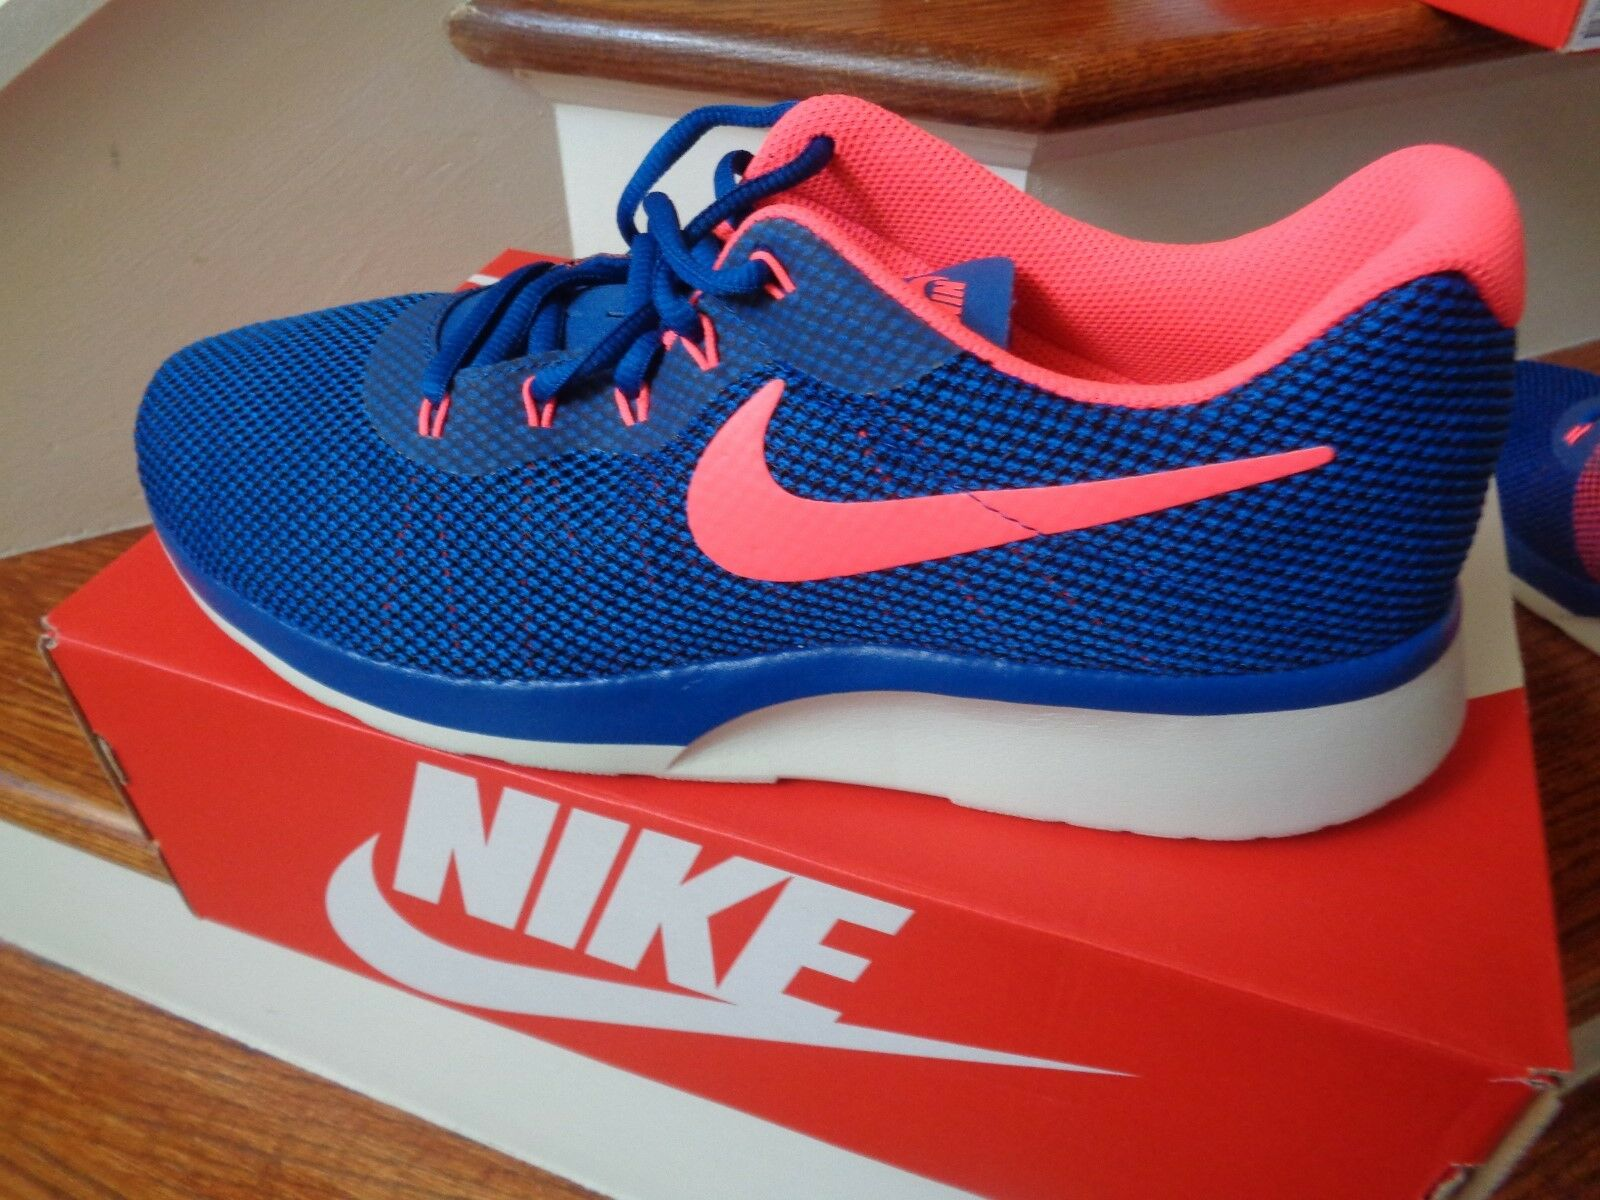 0d5575c30c50 Nike Tanjun Racer Mens 921669-402 Gym Blue Solar Red Running Shoes ...